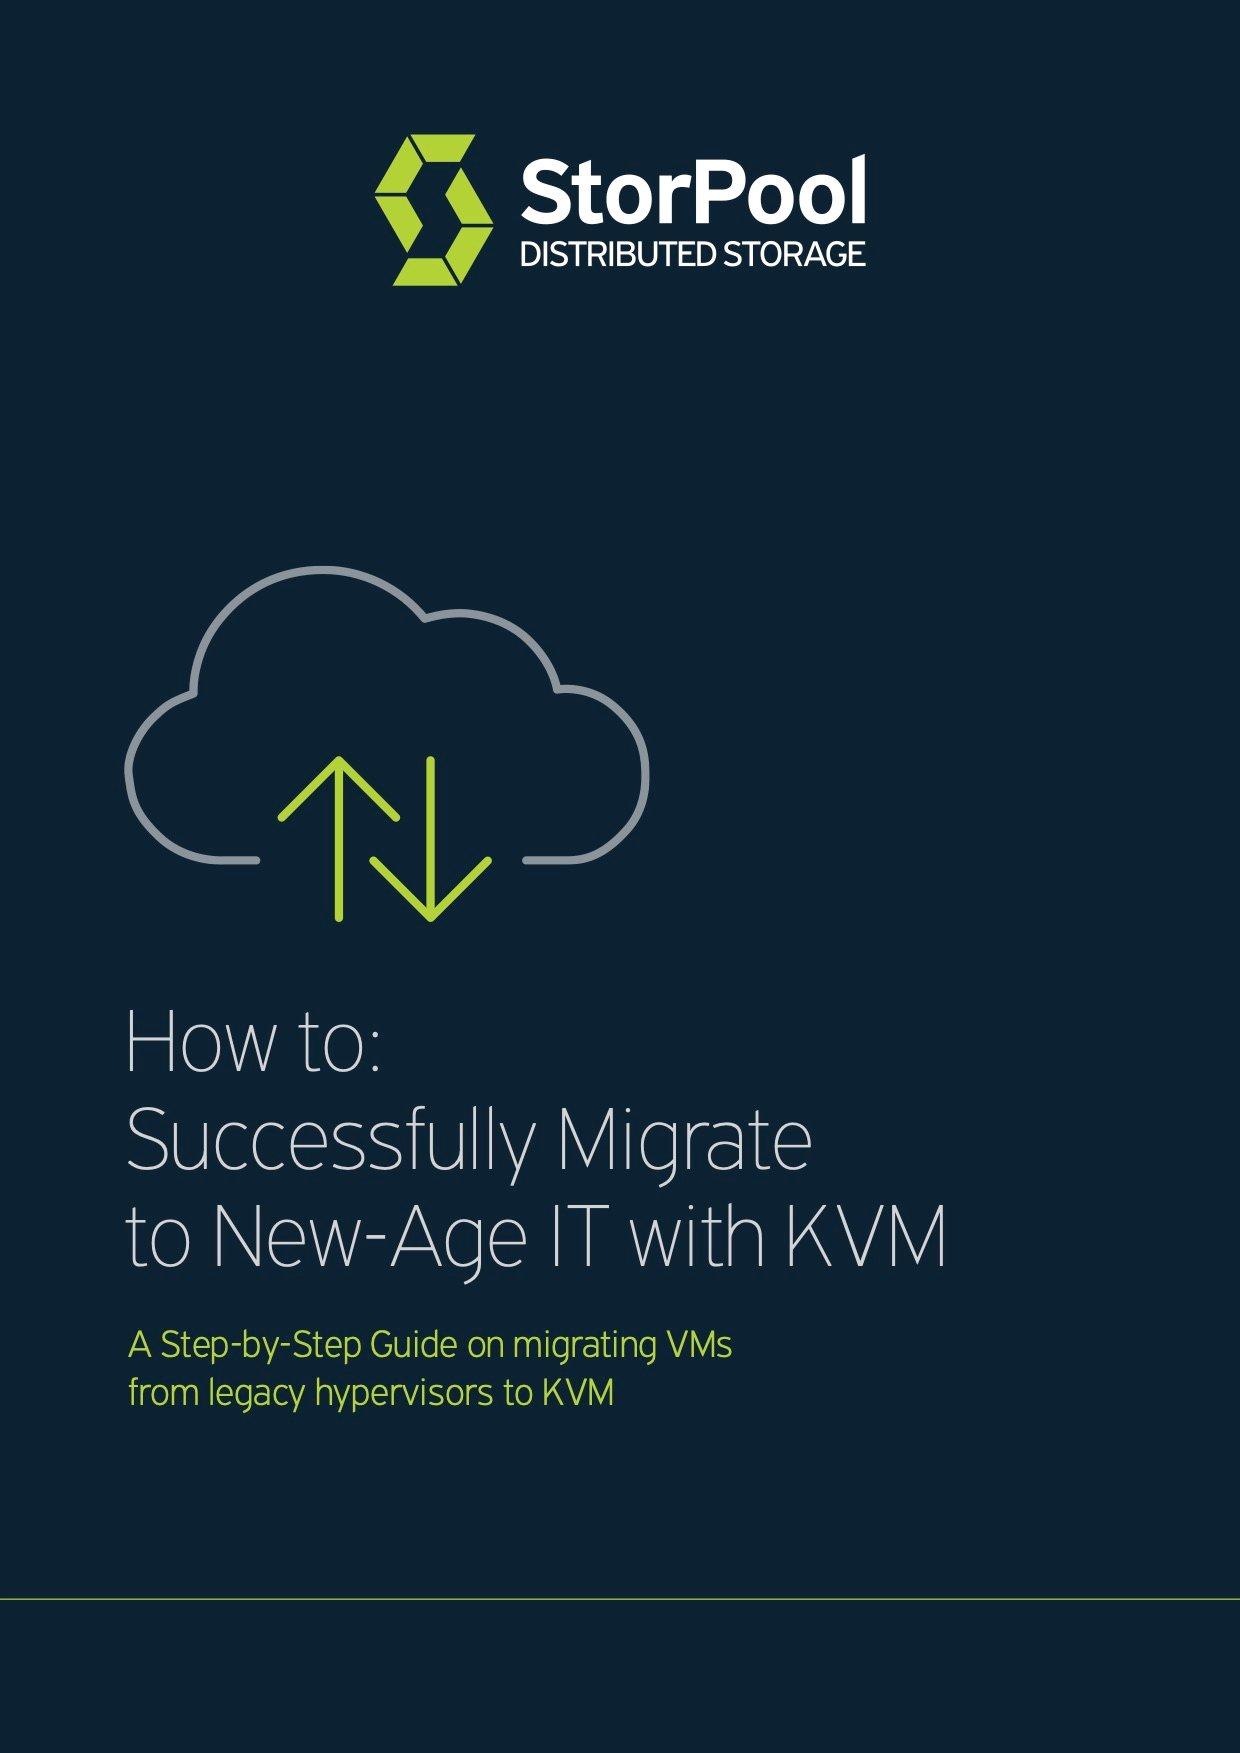 StorPool_VM_Migration_to_KVM